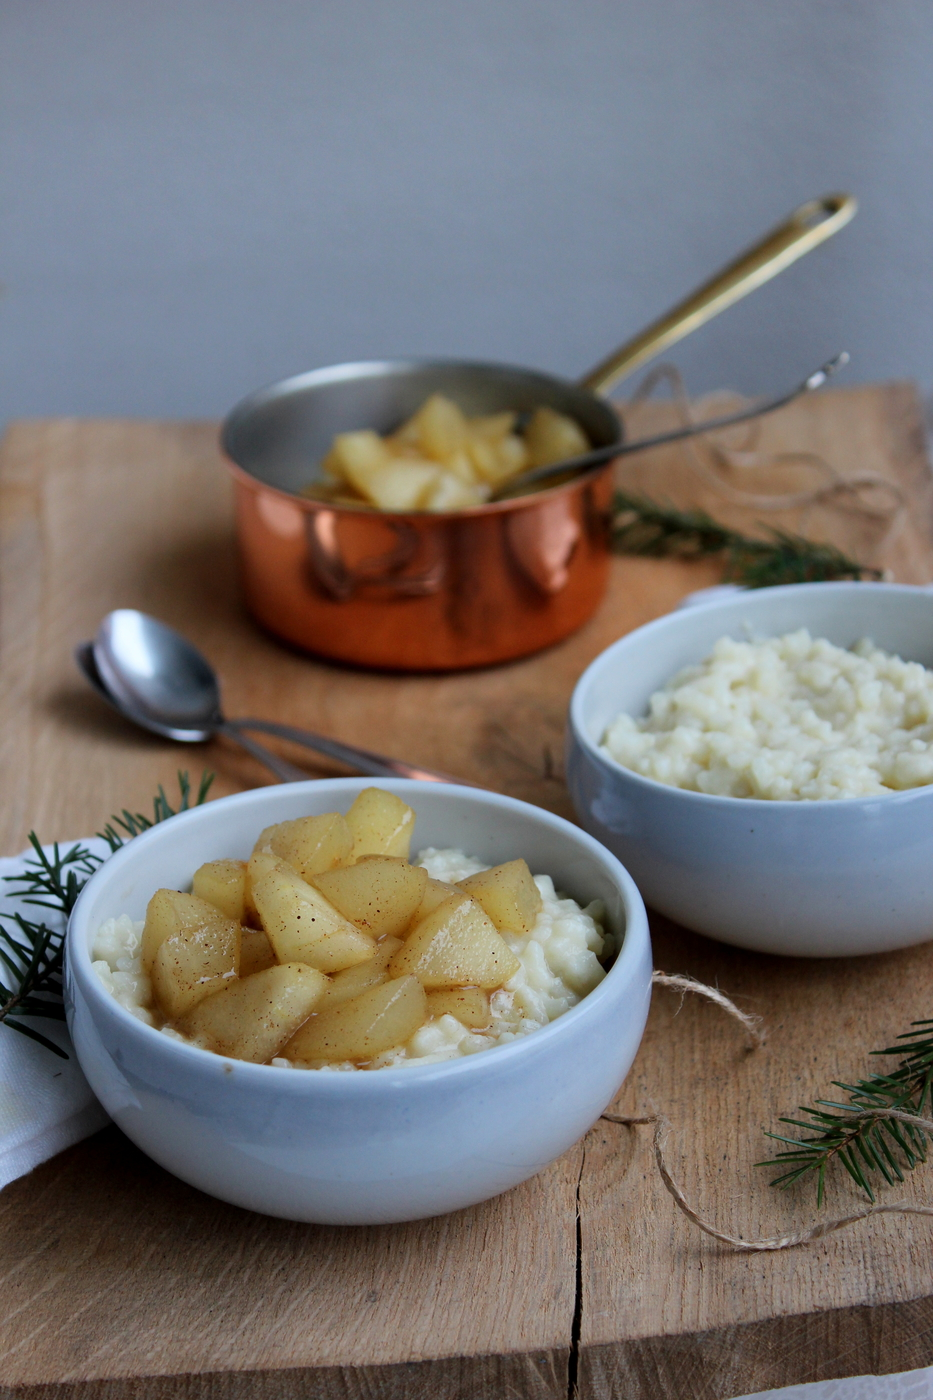 Maidoton riisipuuro ja kaneliset päärynäpalat